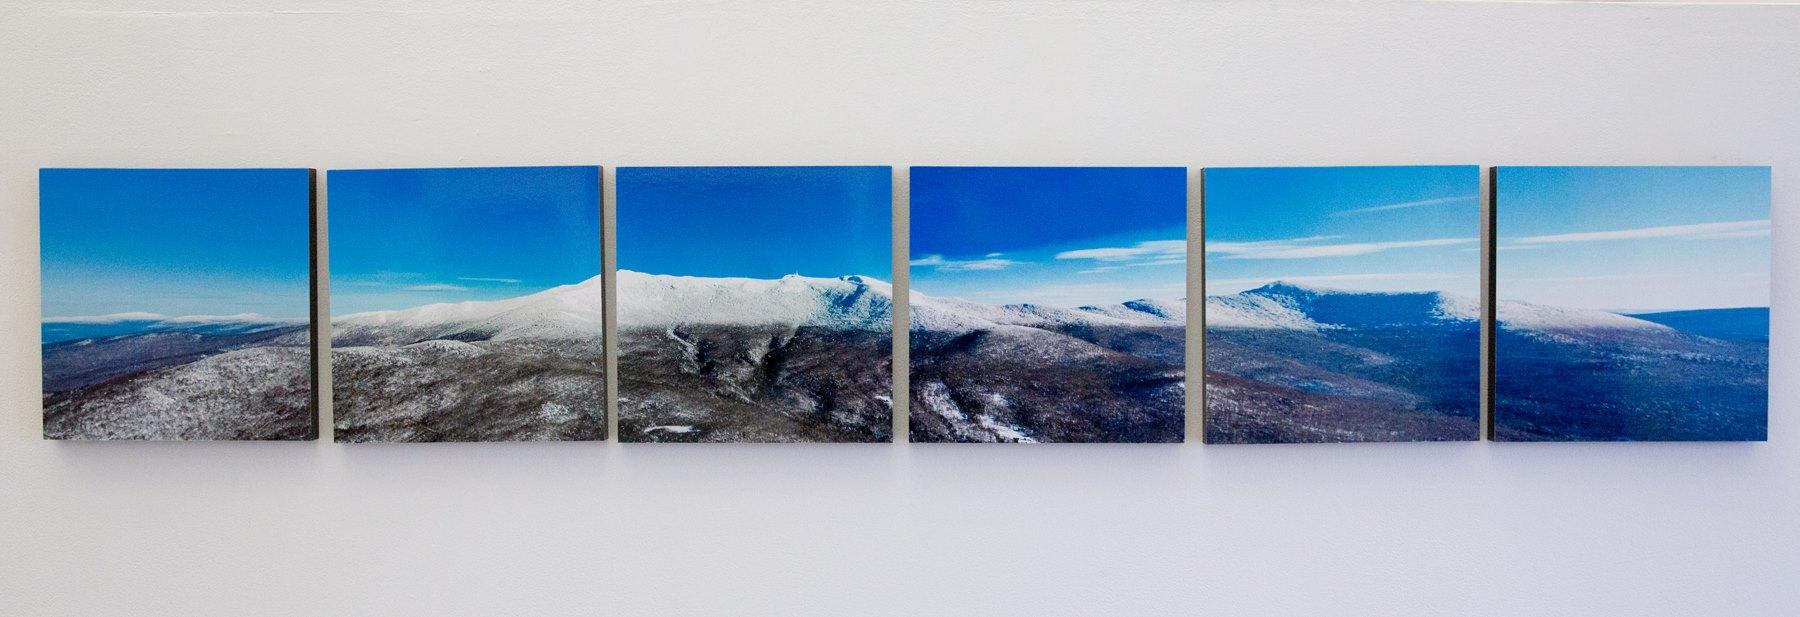 "Matt Benedetto - ""Looking East"" For Sale: $325 Insta: @vermontaerialphoto"